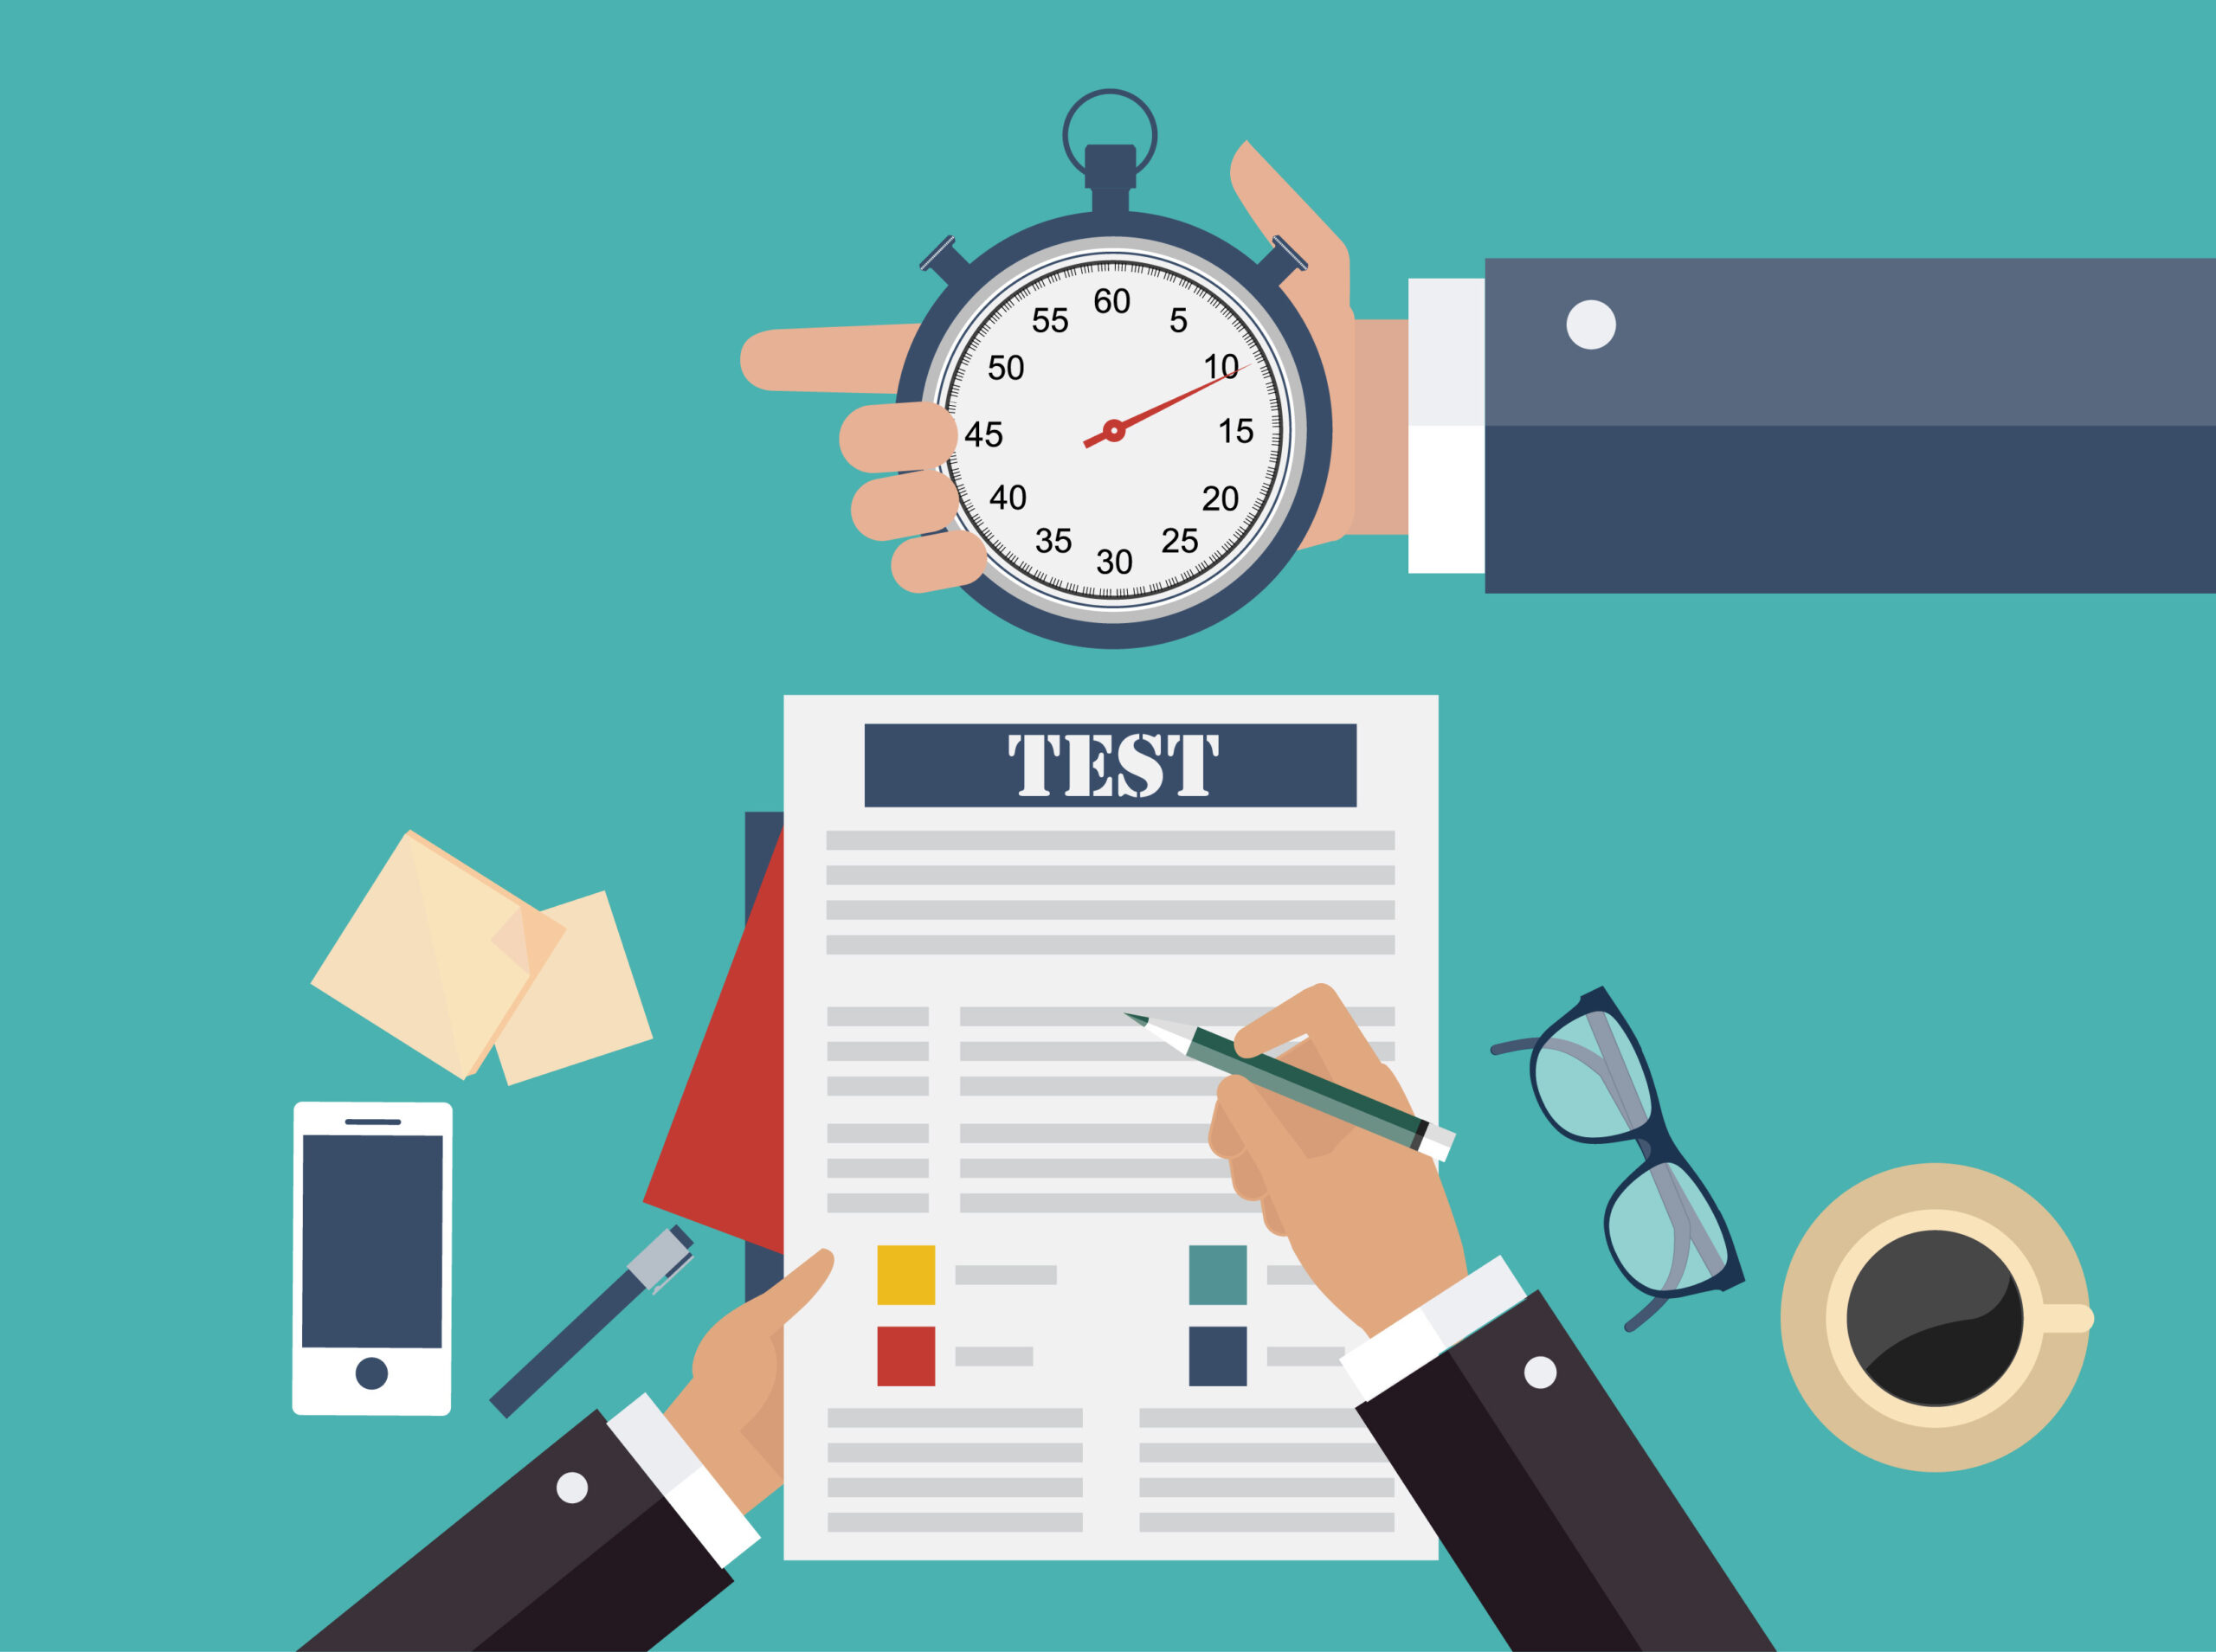 test tuyển dụng